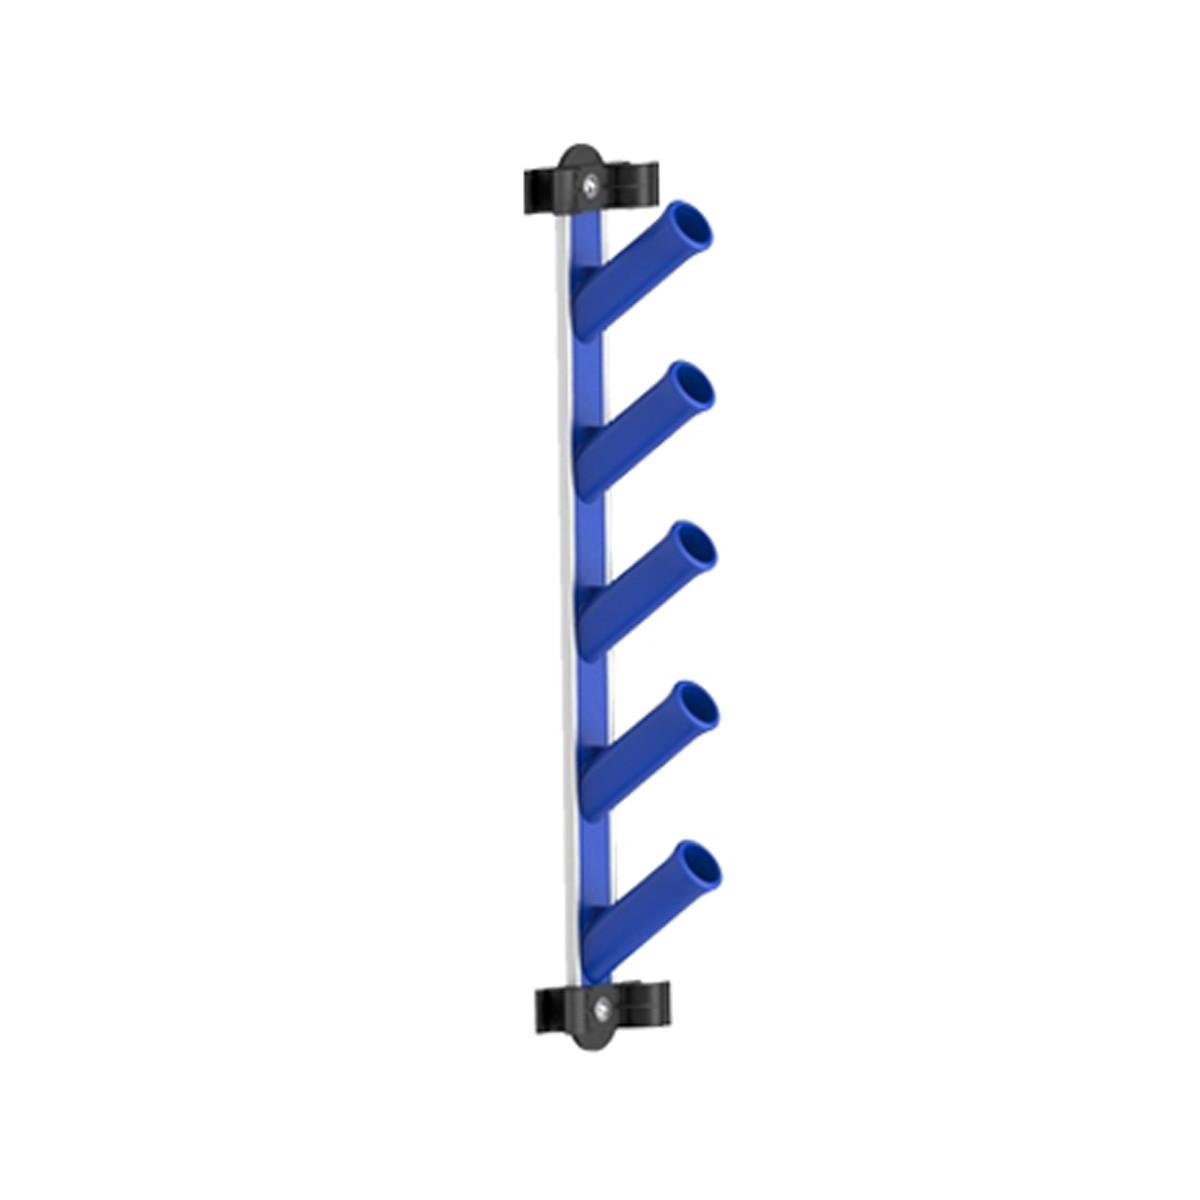 Bayrol  Ersatzclips  für Bürsten Kescher etc V-Form  3 Stck